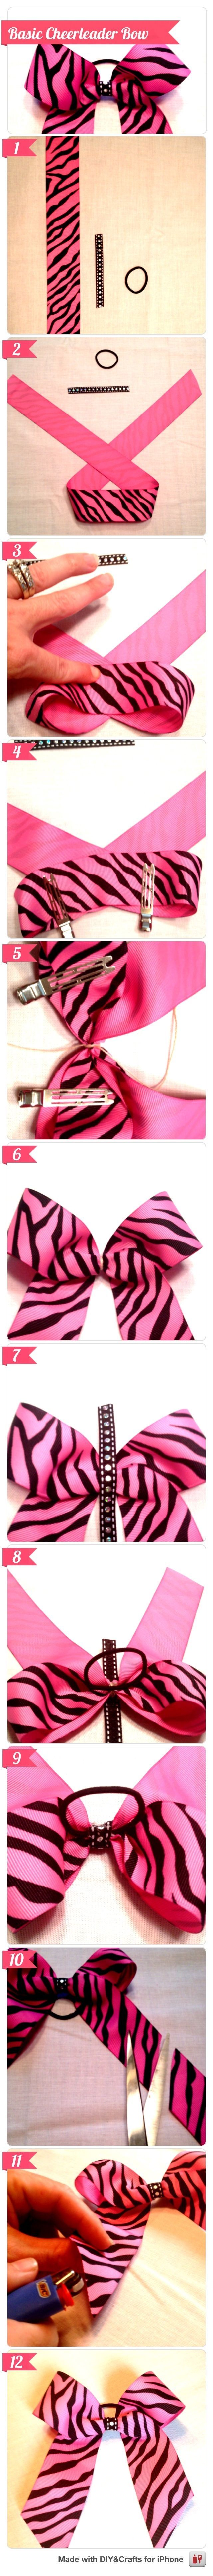 DIY Basic Cheerleader Bow